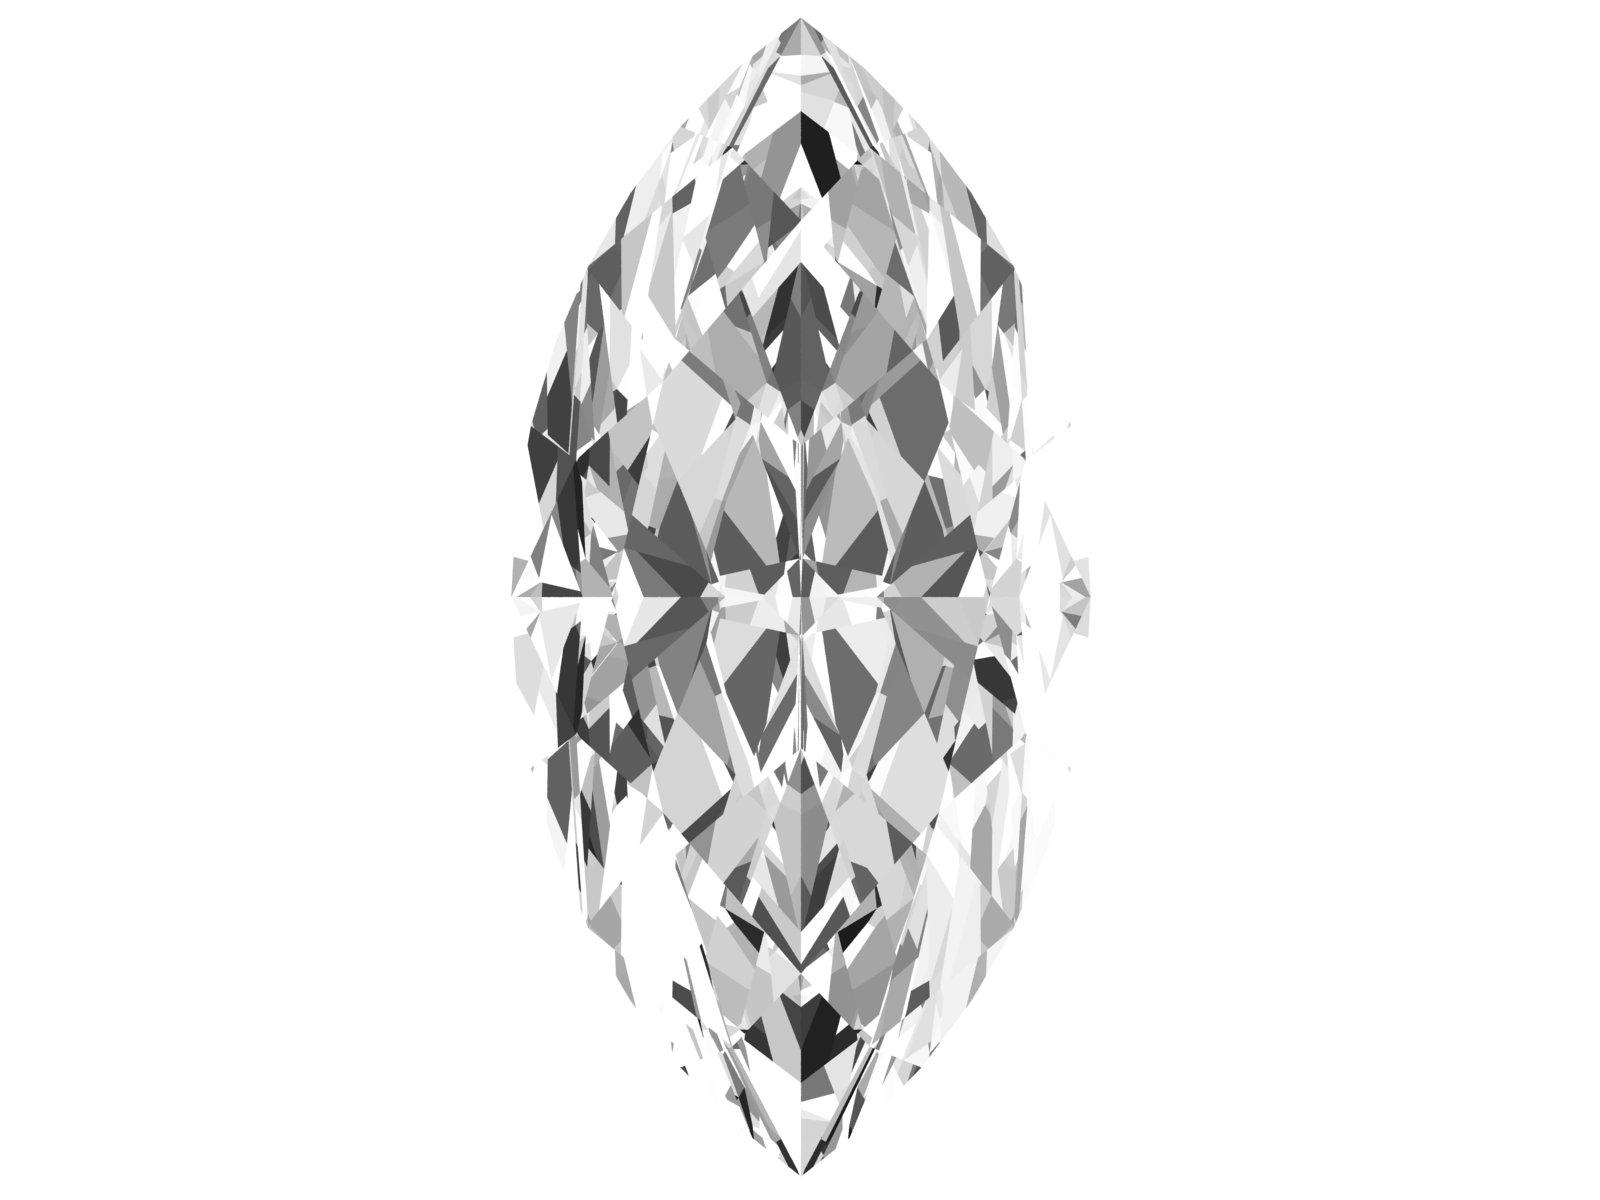 0.24 Carat Marquise Diamond